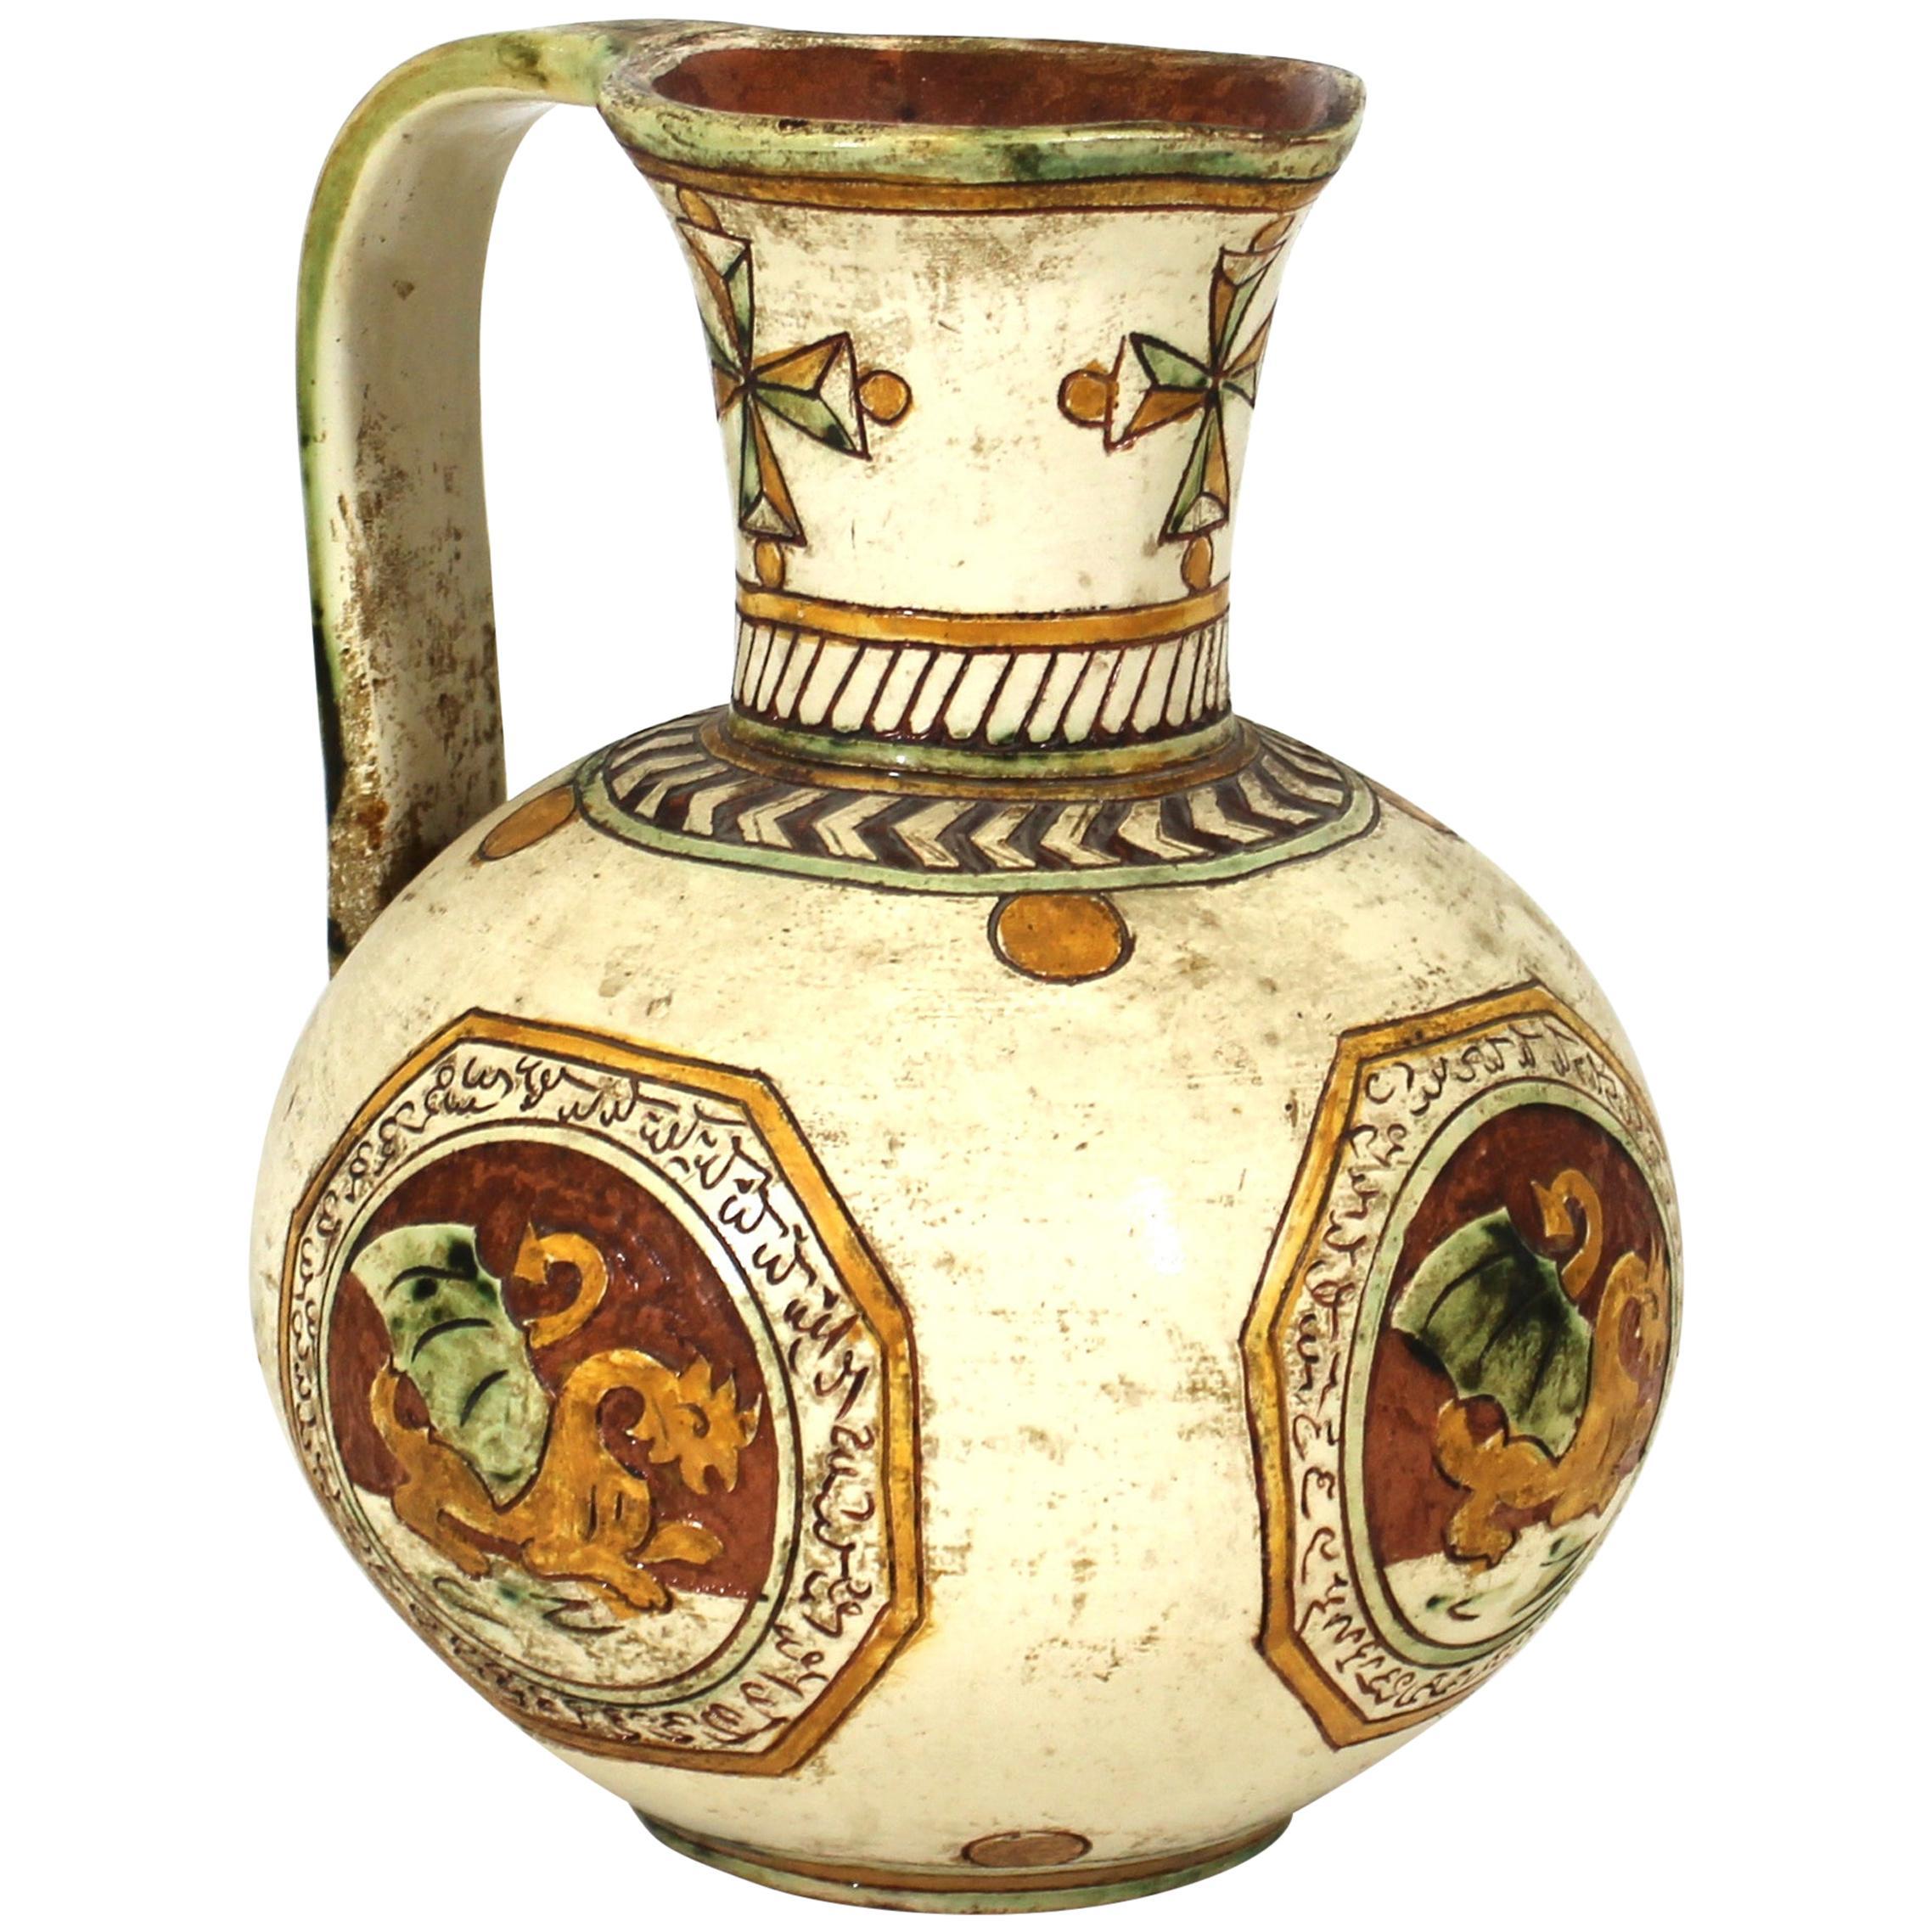 Italian Renaissance Revival Sgraffito Ceramic Pitcher with Dragon Motif